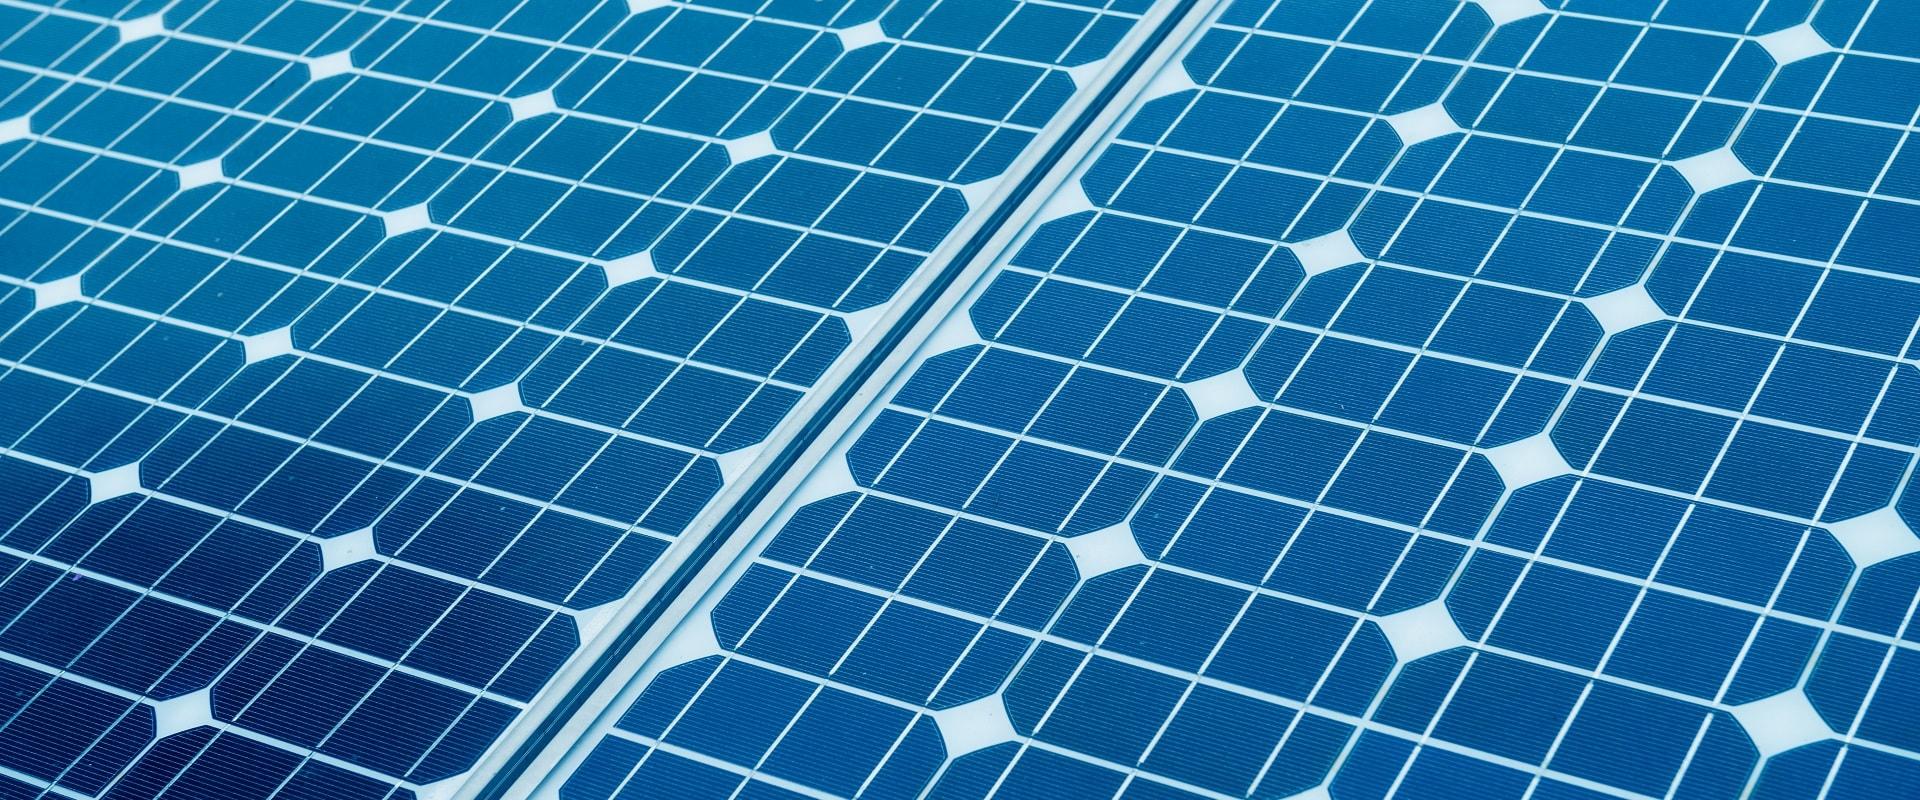 Photovoltaik und Solartechnik